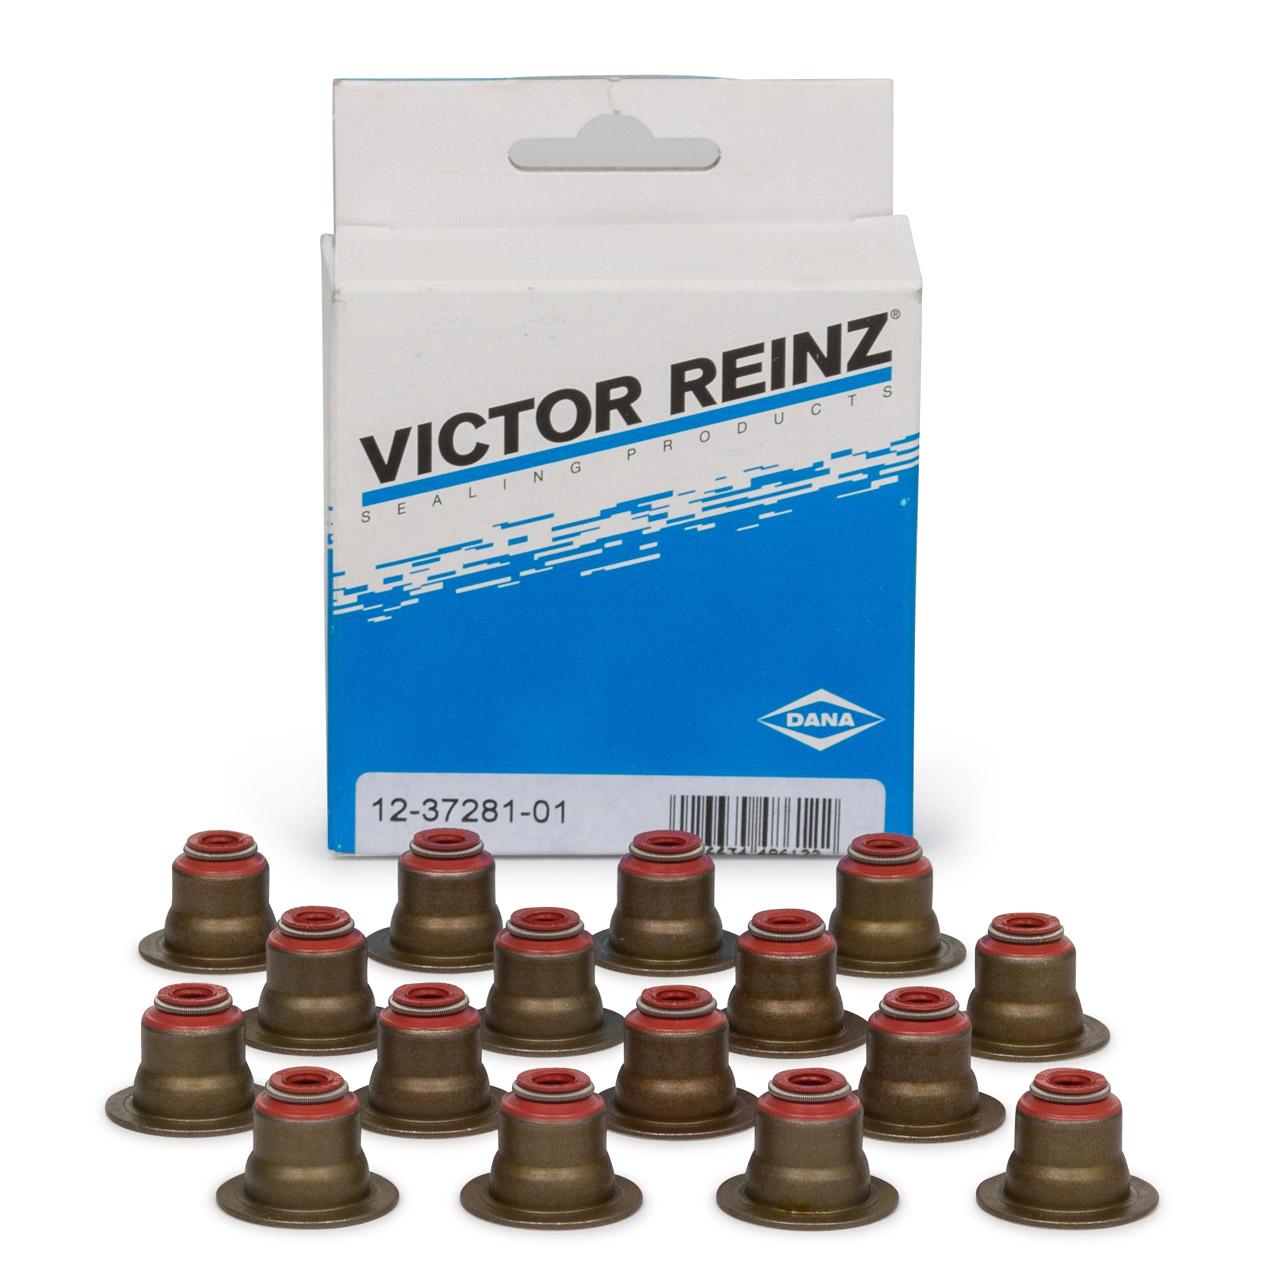 16x REINZ Ventilschaftabdichtung 6mm für BMW N40 N42 N45 N46 N62 N63 S63 M67 11340029751